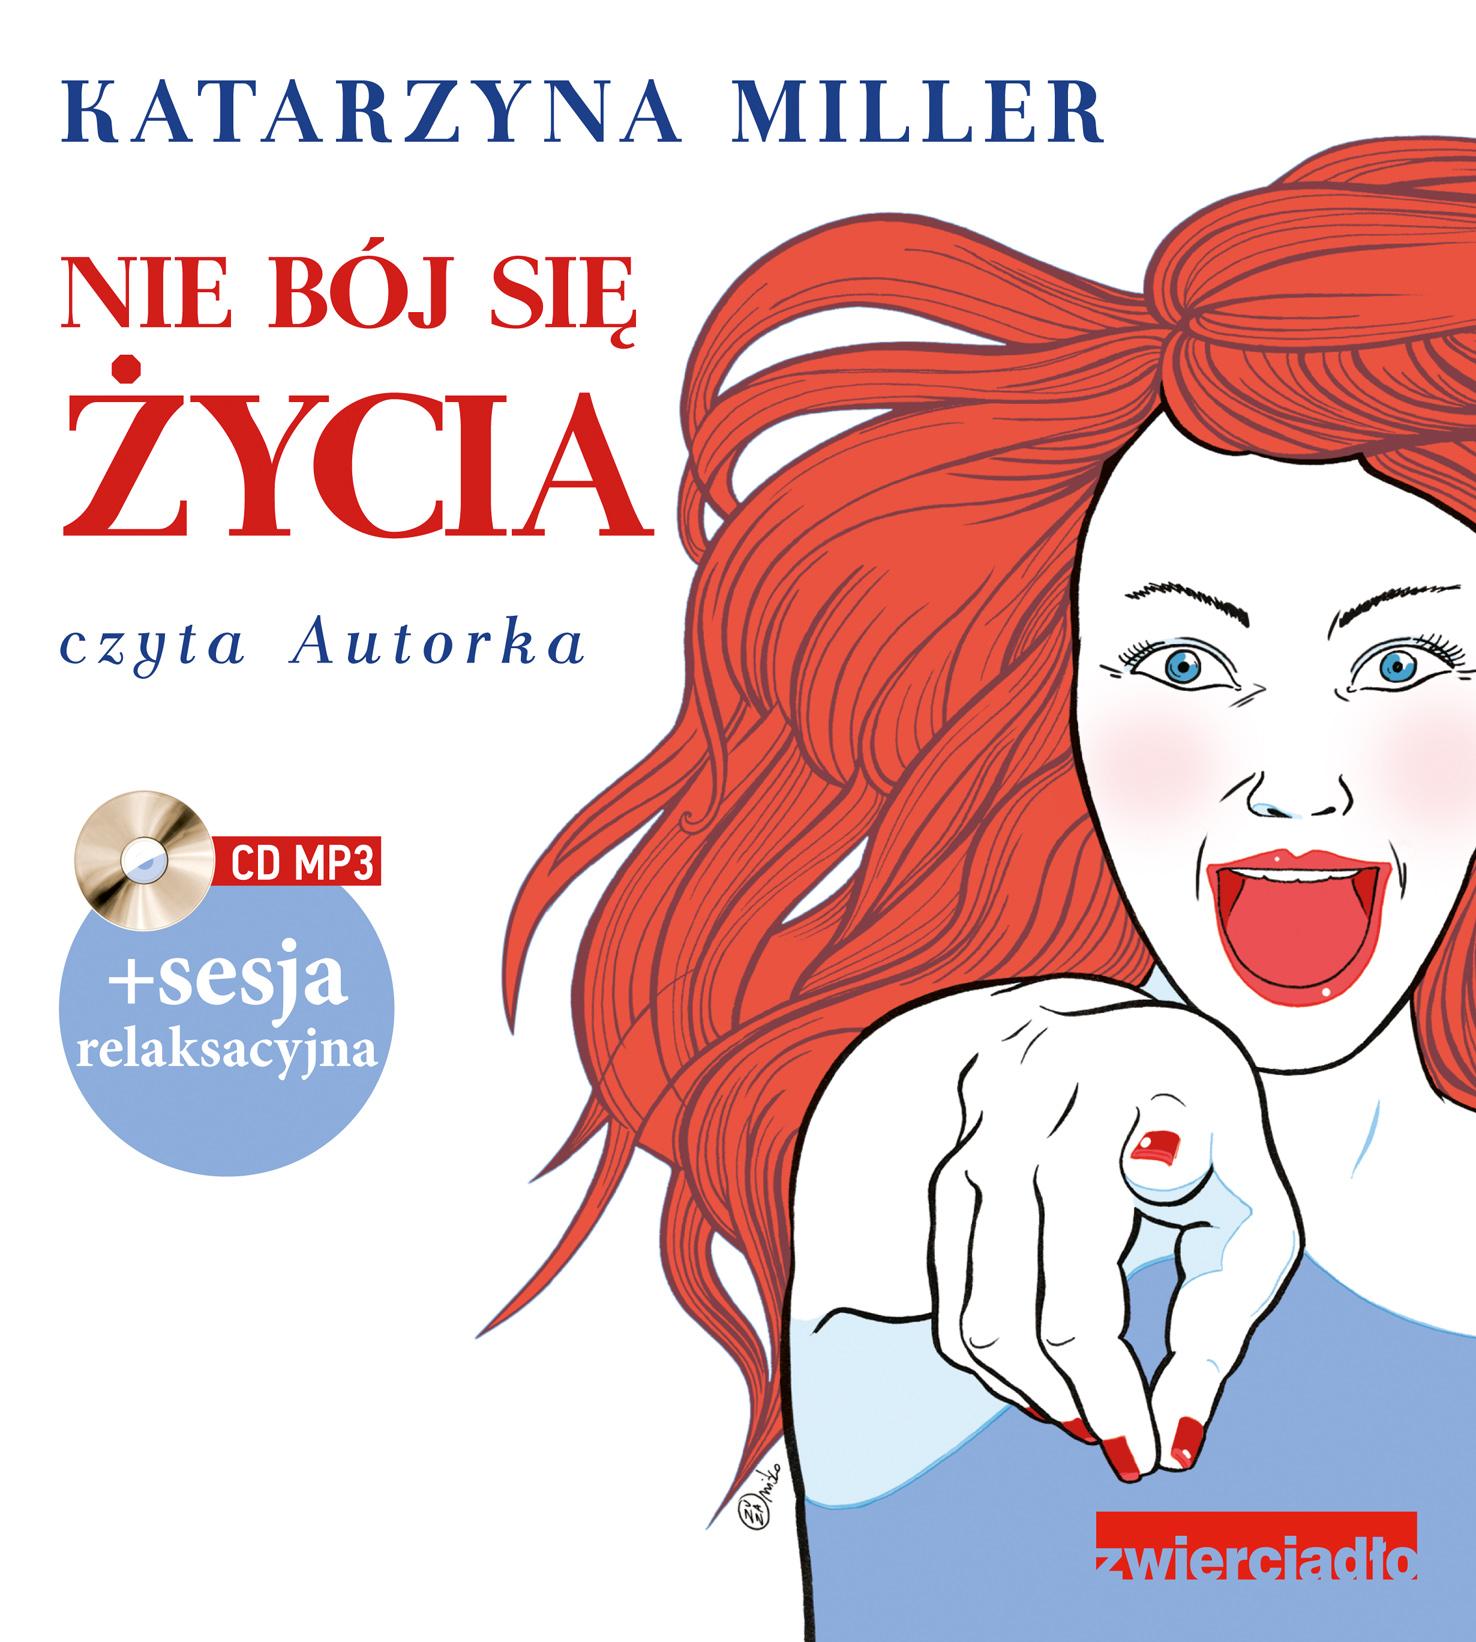 NIE BOJ SIE ZYCIA_AUDIObook_okladka_front_300ppi